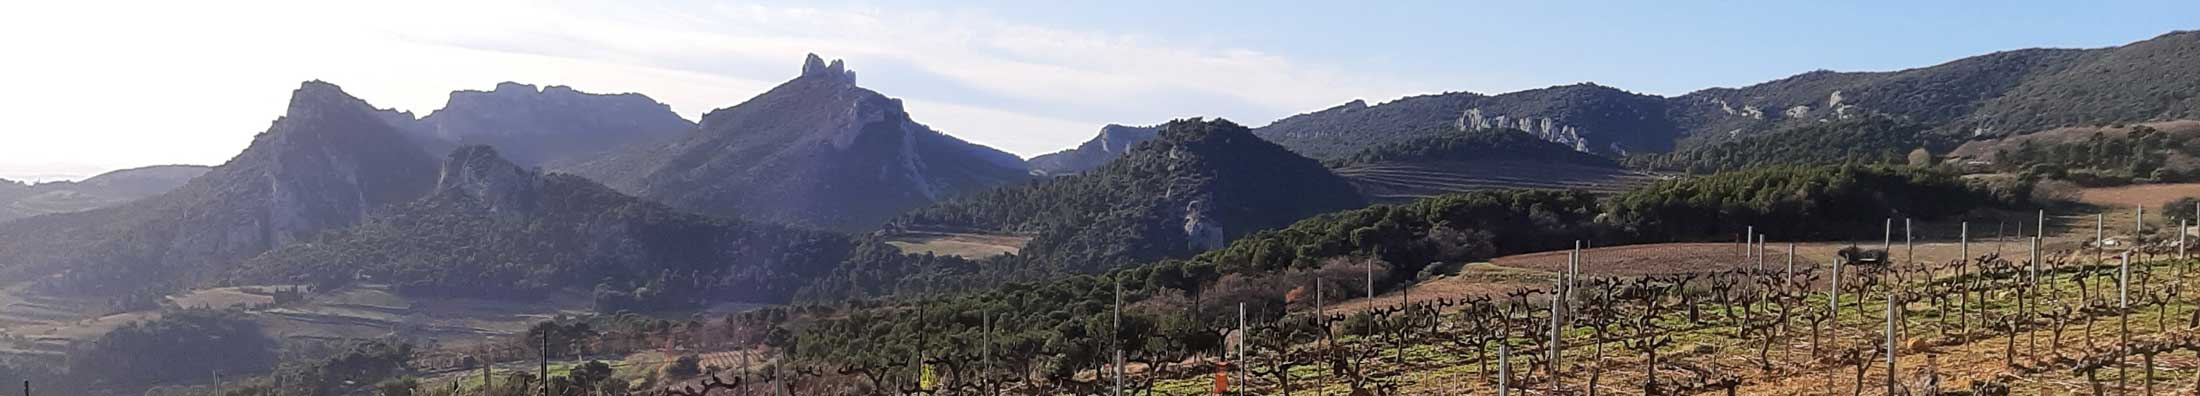 Beste Bed and Breakfast - Frankrijk - Provence-Alpes-Côte d'Azur - Vaucluse - Mazan - Le Mas de Canteperdrix - topfoto